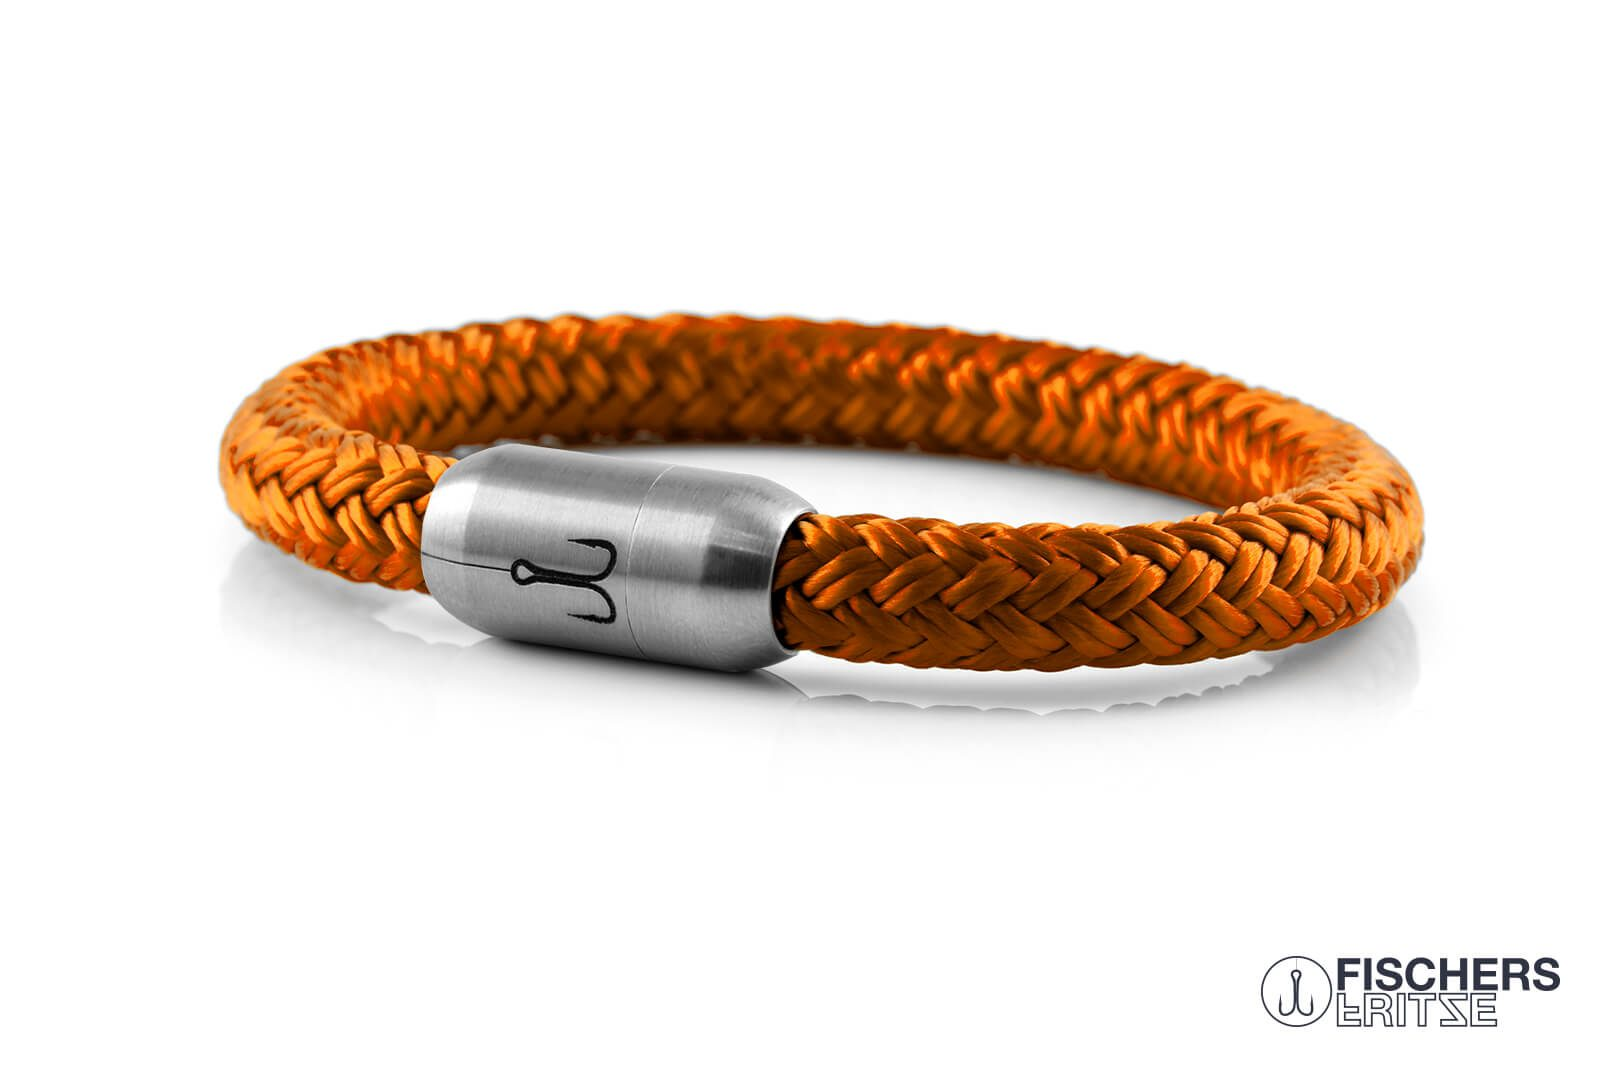 armband fischers fritze makrele orange segeltau